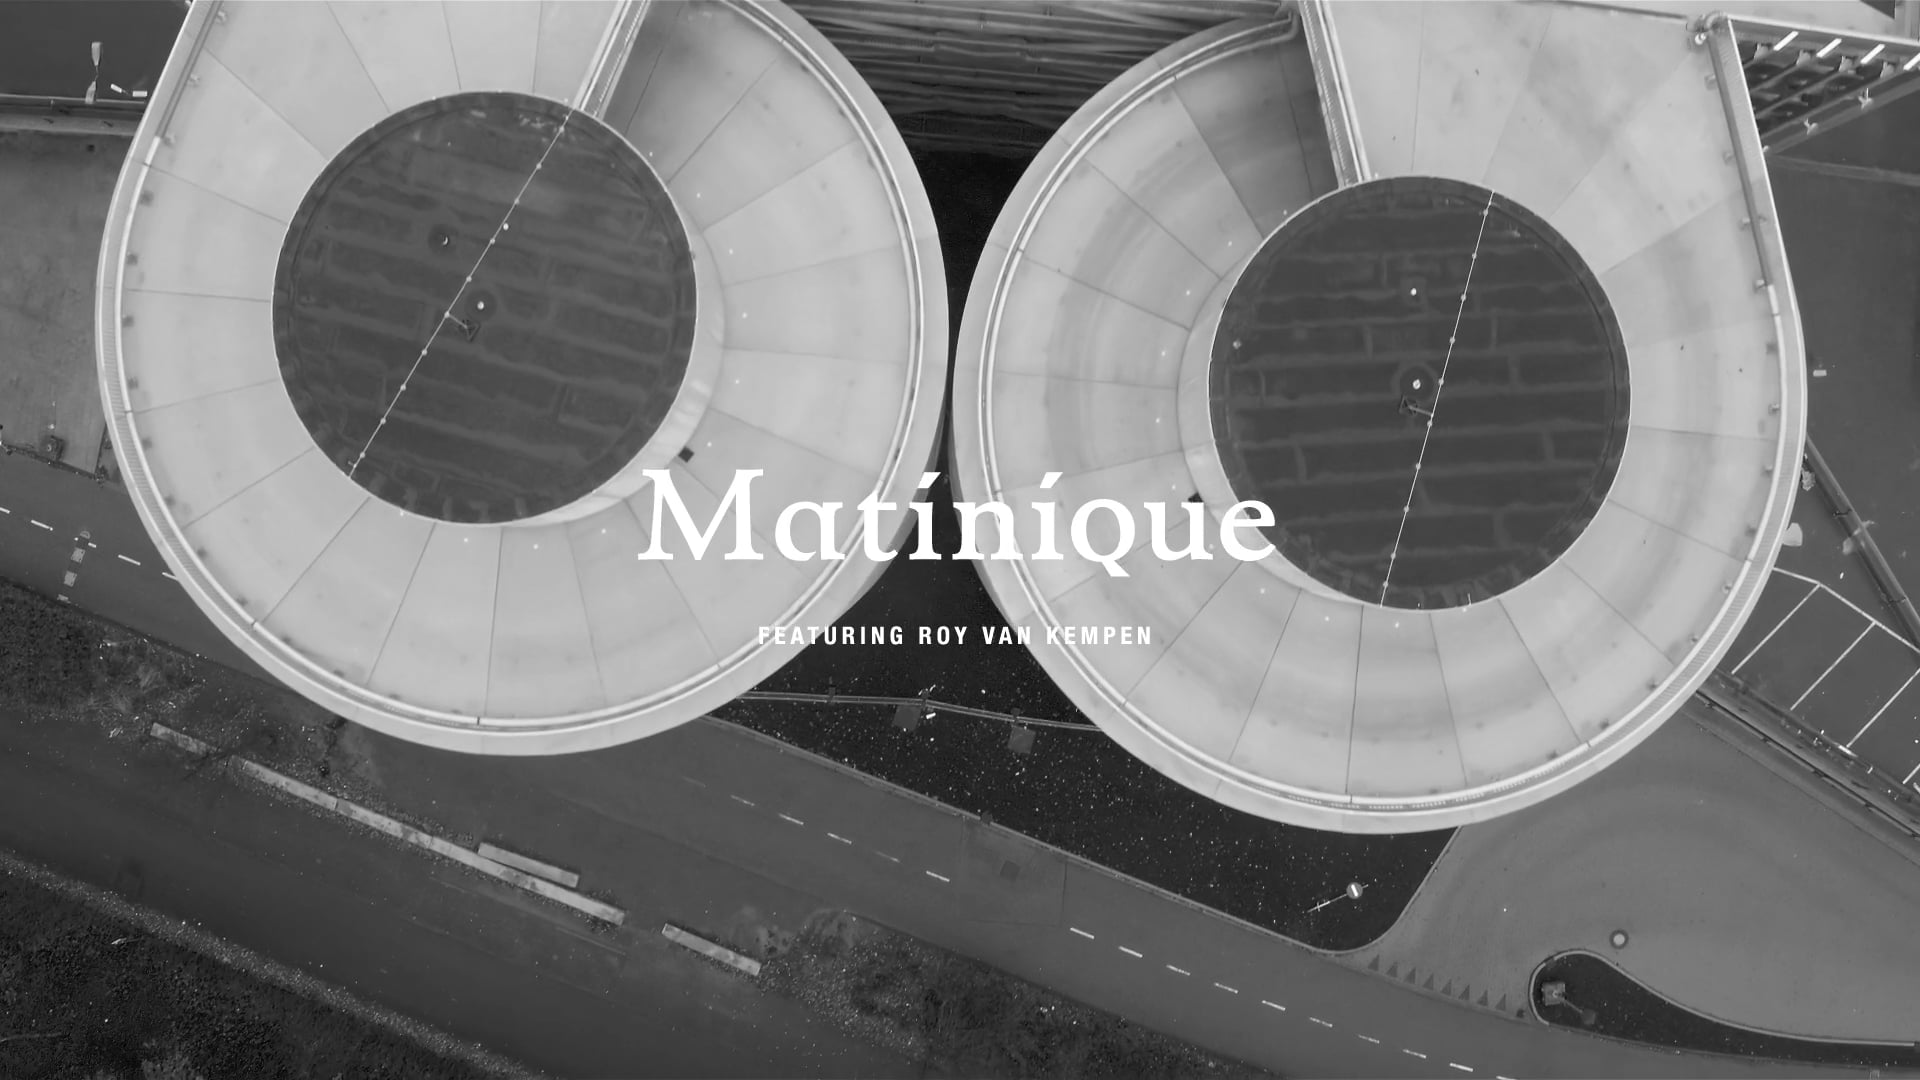 Matinique Campaign Film 2017